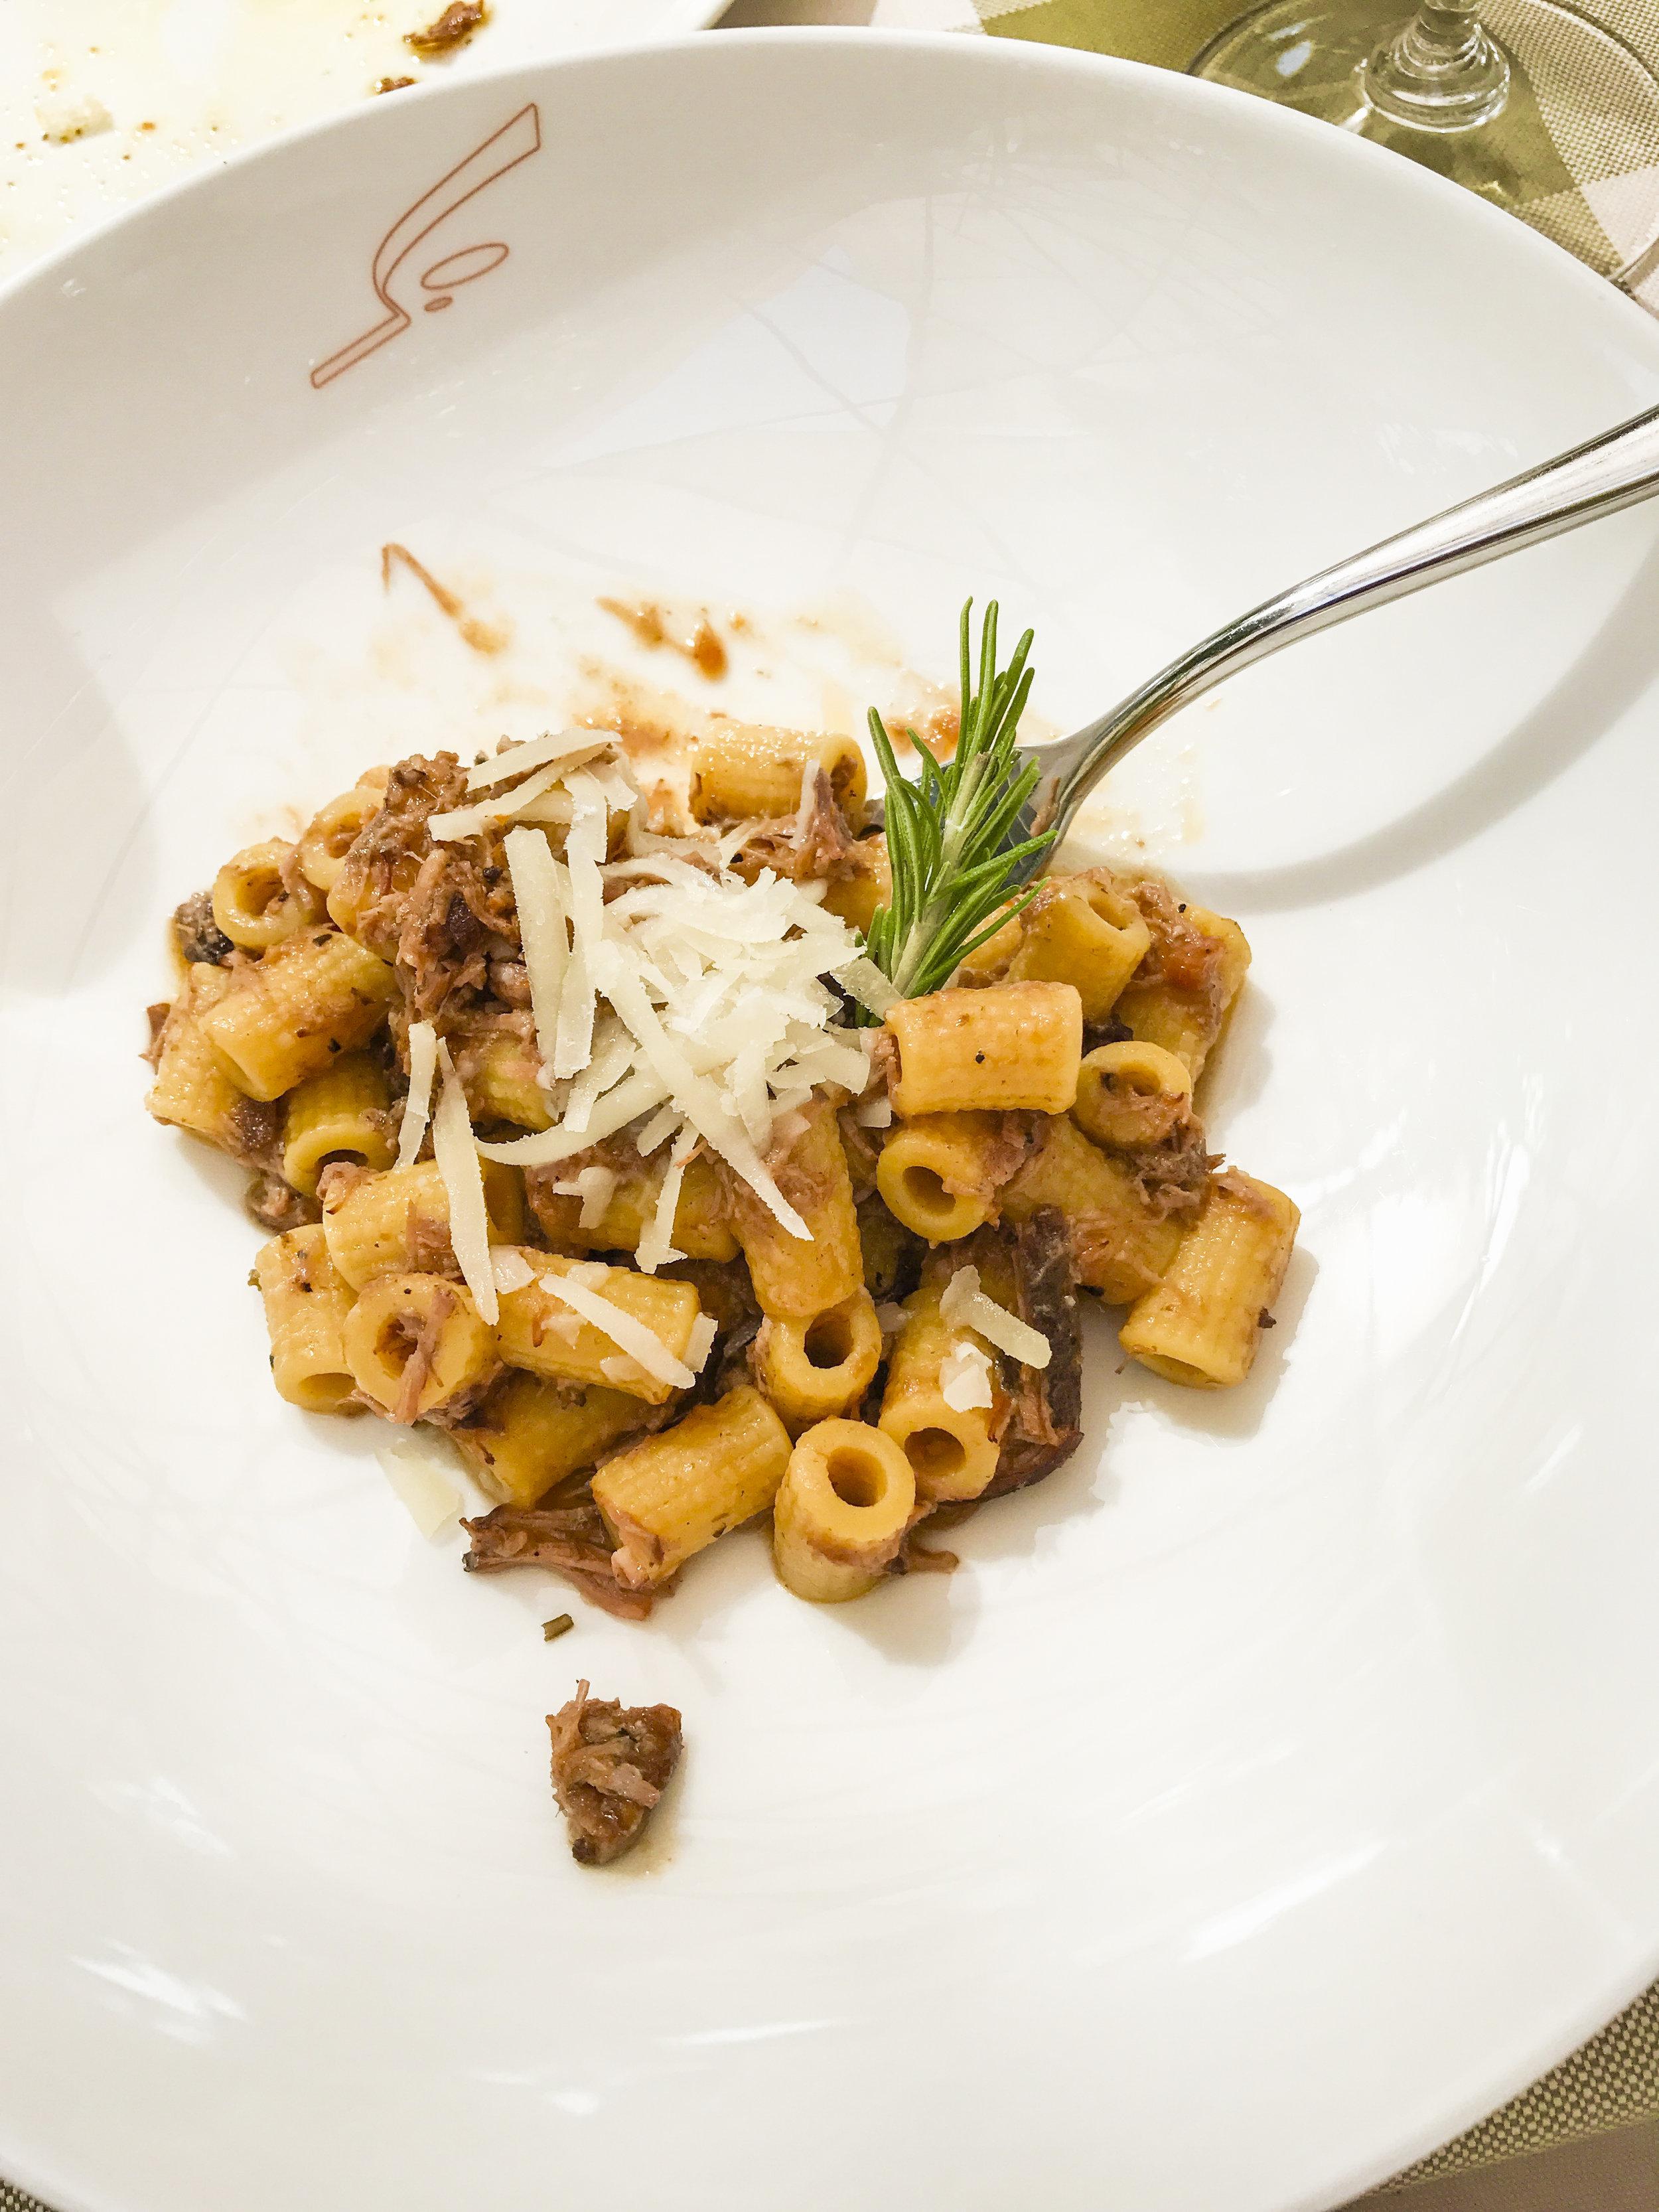 Maccheroncelli al sugo di anatra ~ short macaroni pasta with Tuscan style duck ragout